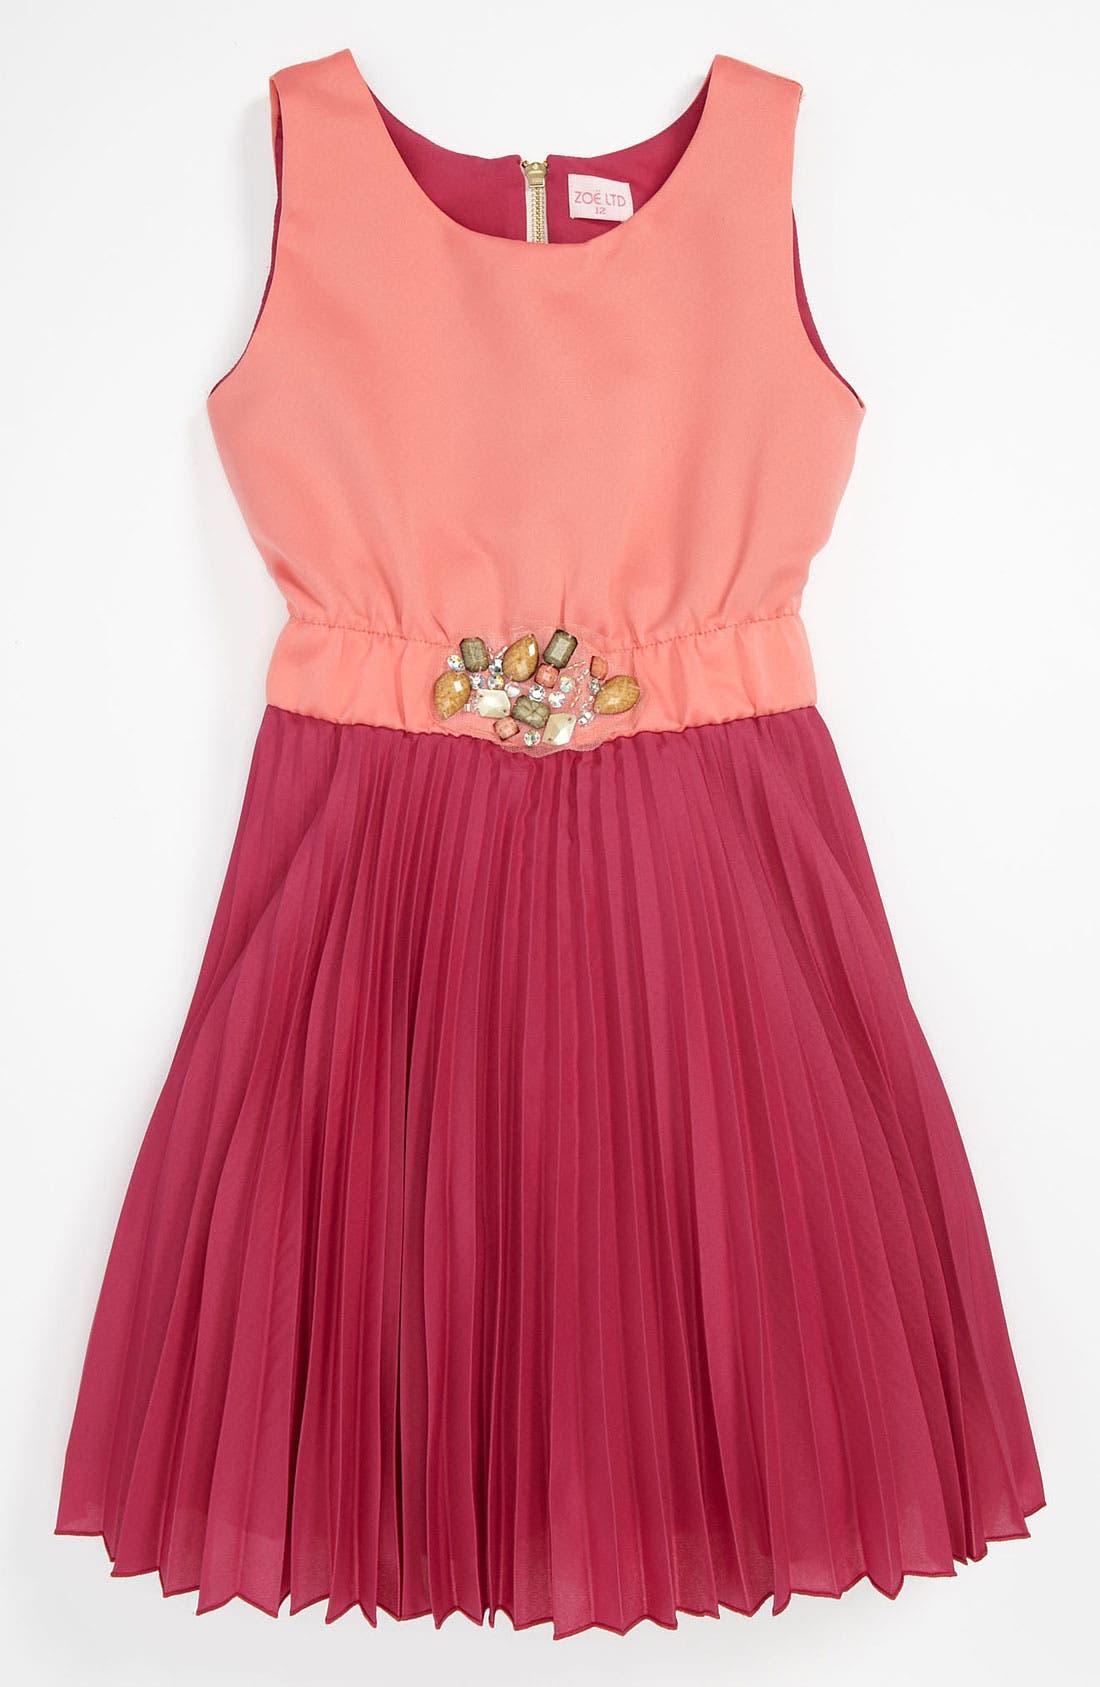 Alternate Image 1 Selected - Zoe Pleat Dress (Big Girls)